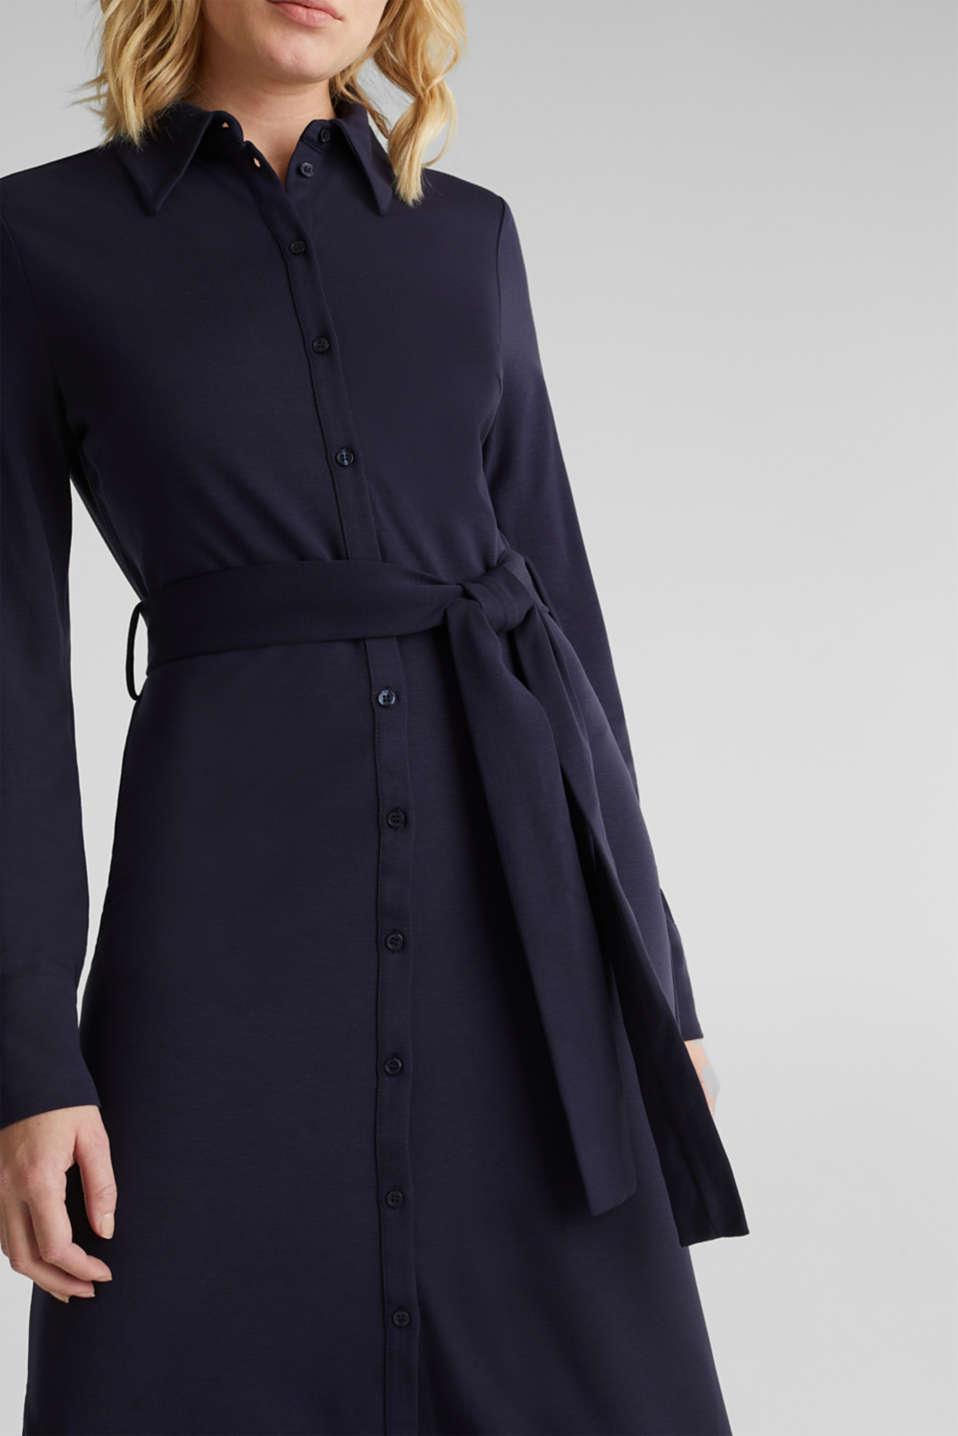 Stretch jersey shirt dress, NAVY, detail image number 3